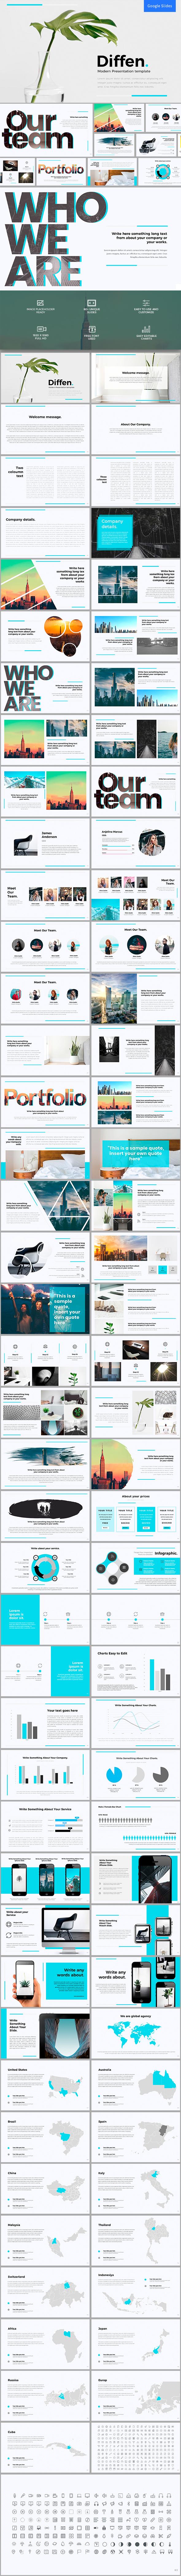 Diffen Google Slides - Google Slides Presentation Templates